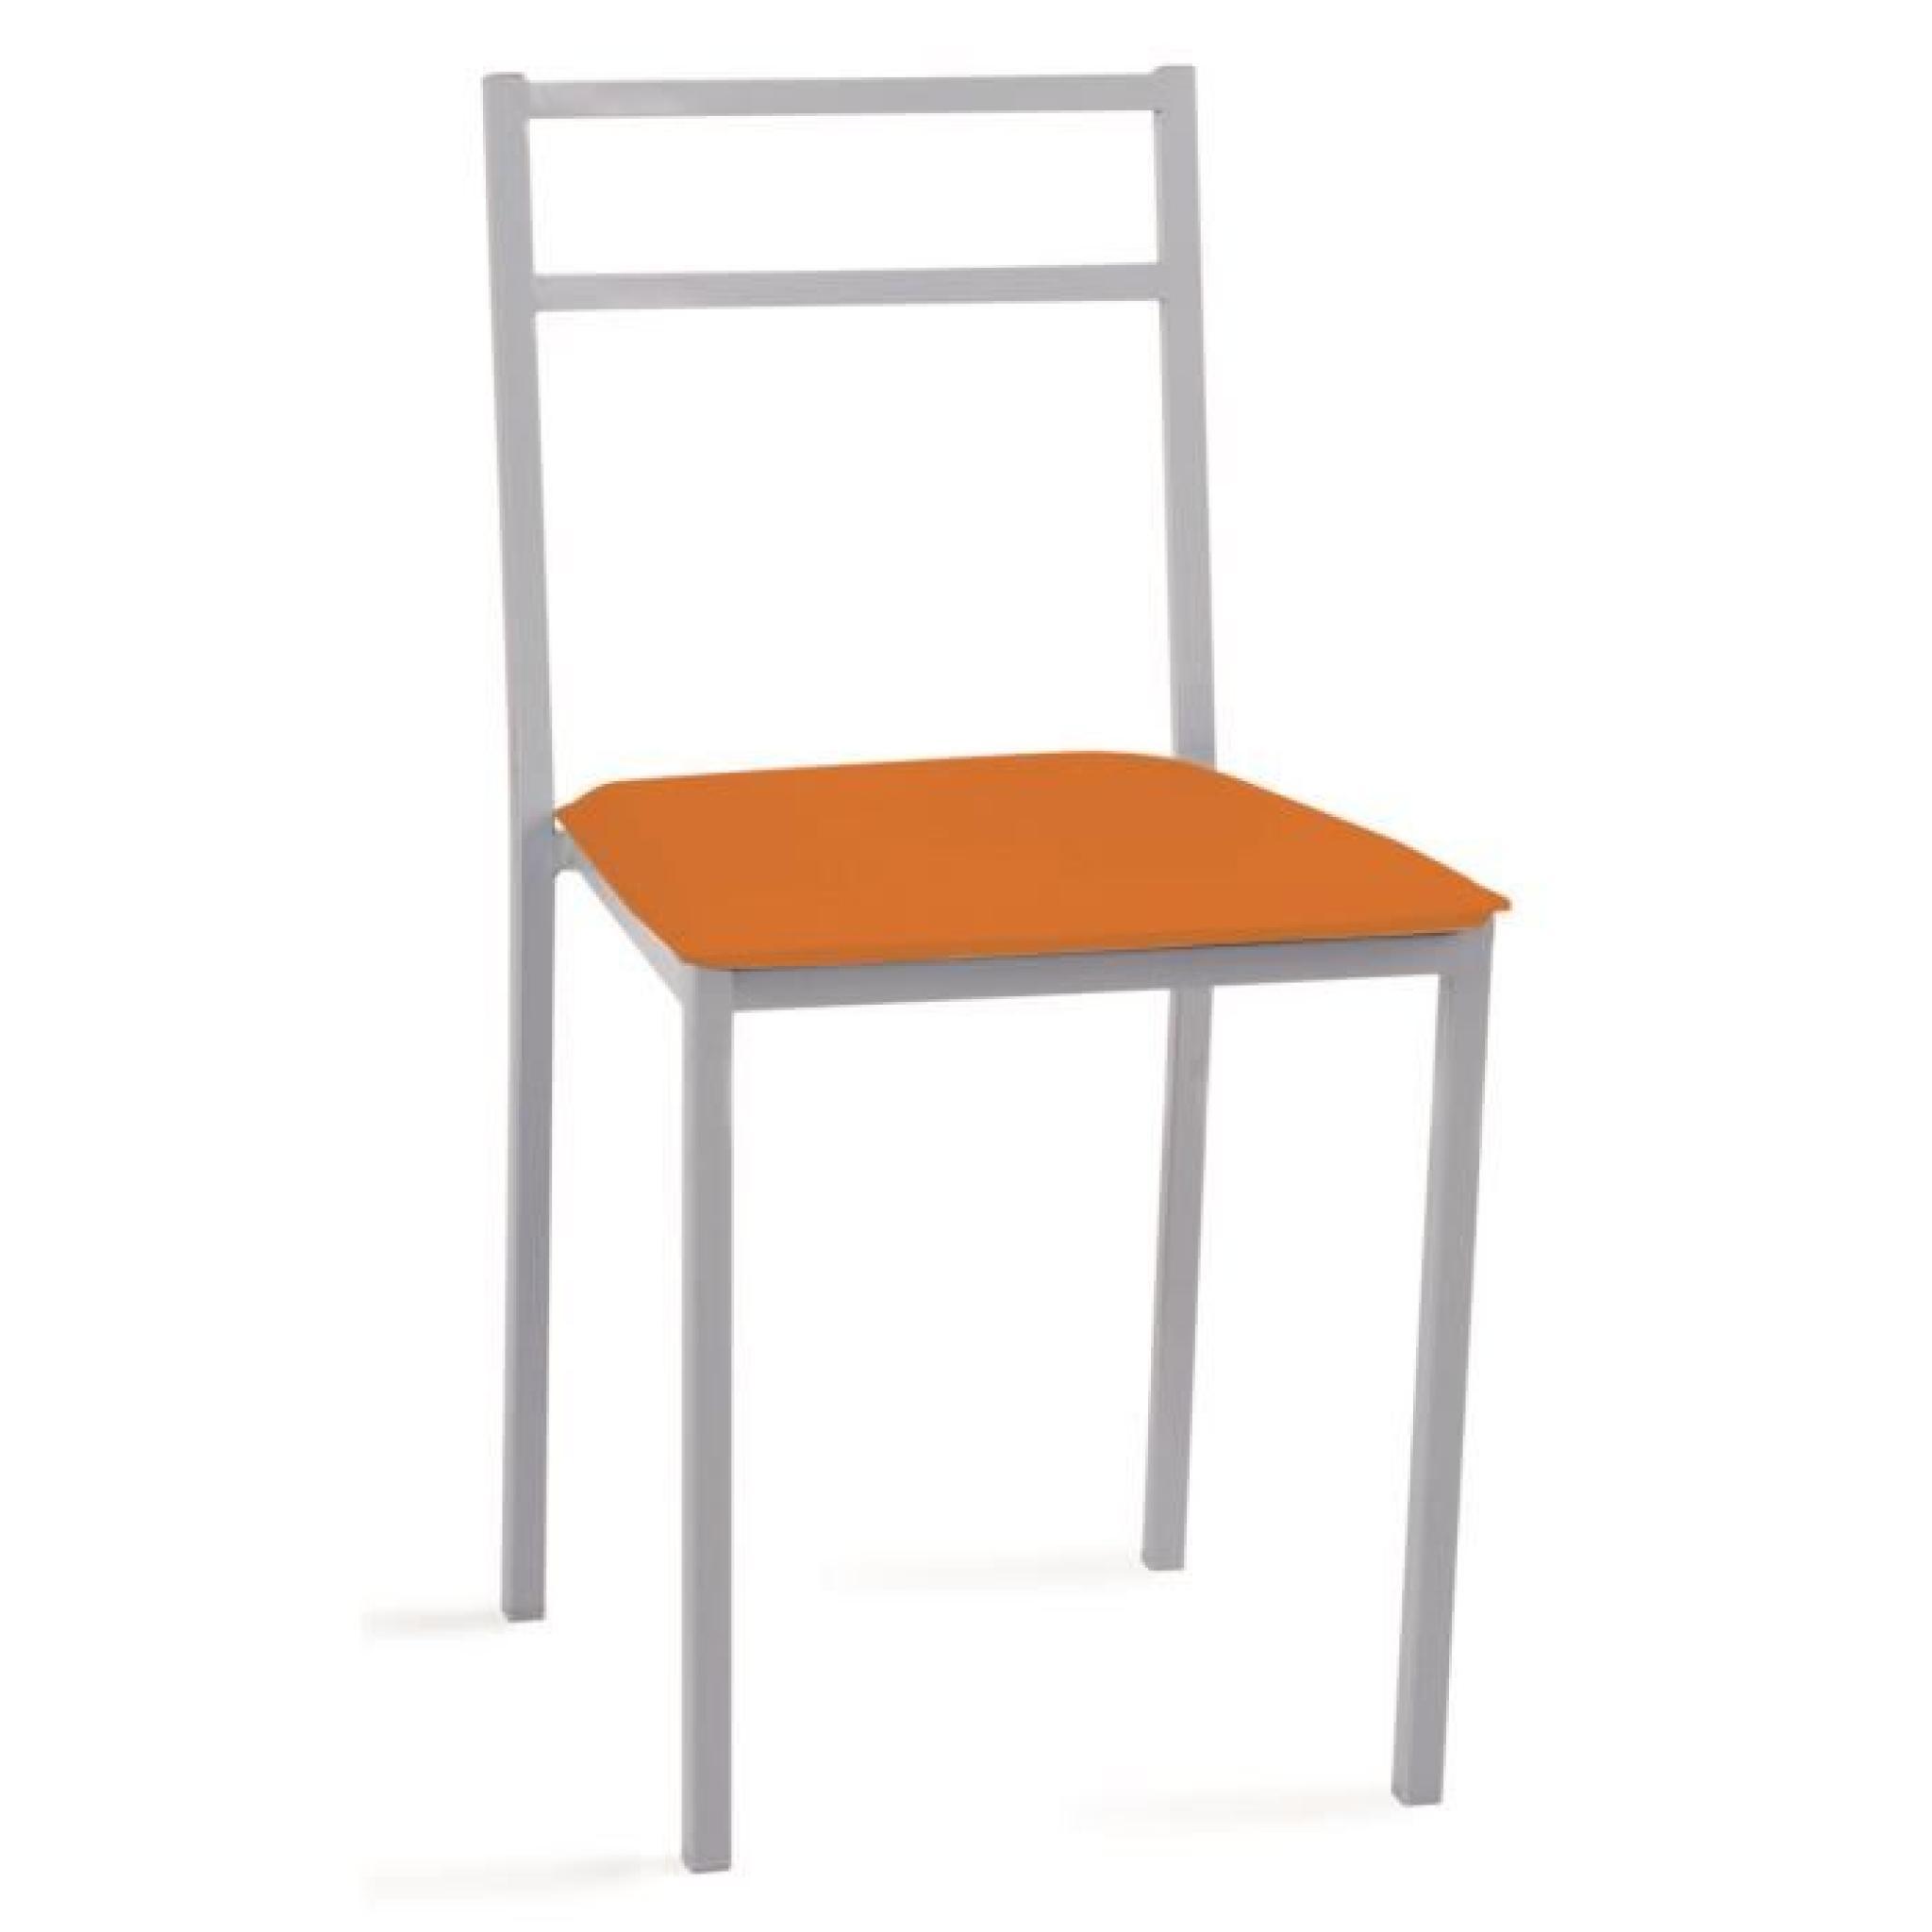 Chaise Orange Metalique 420 X 475 X 810 Mm Achat Vente